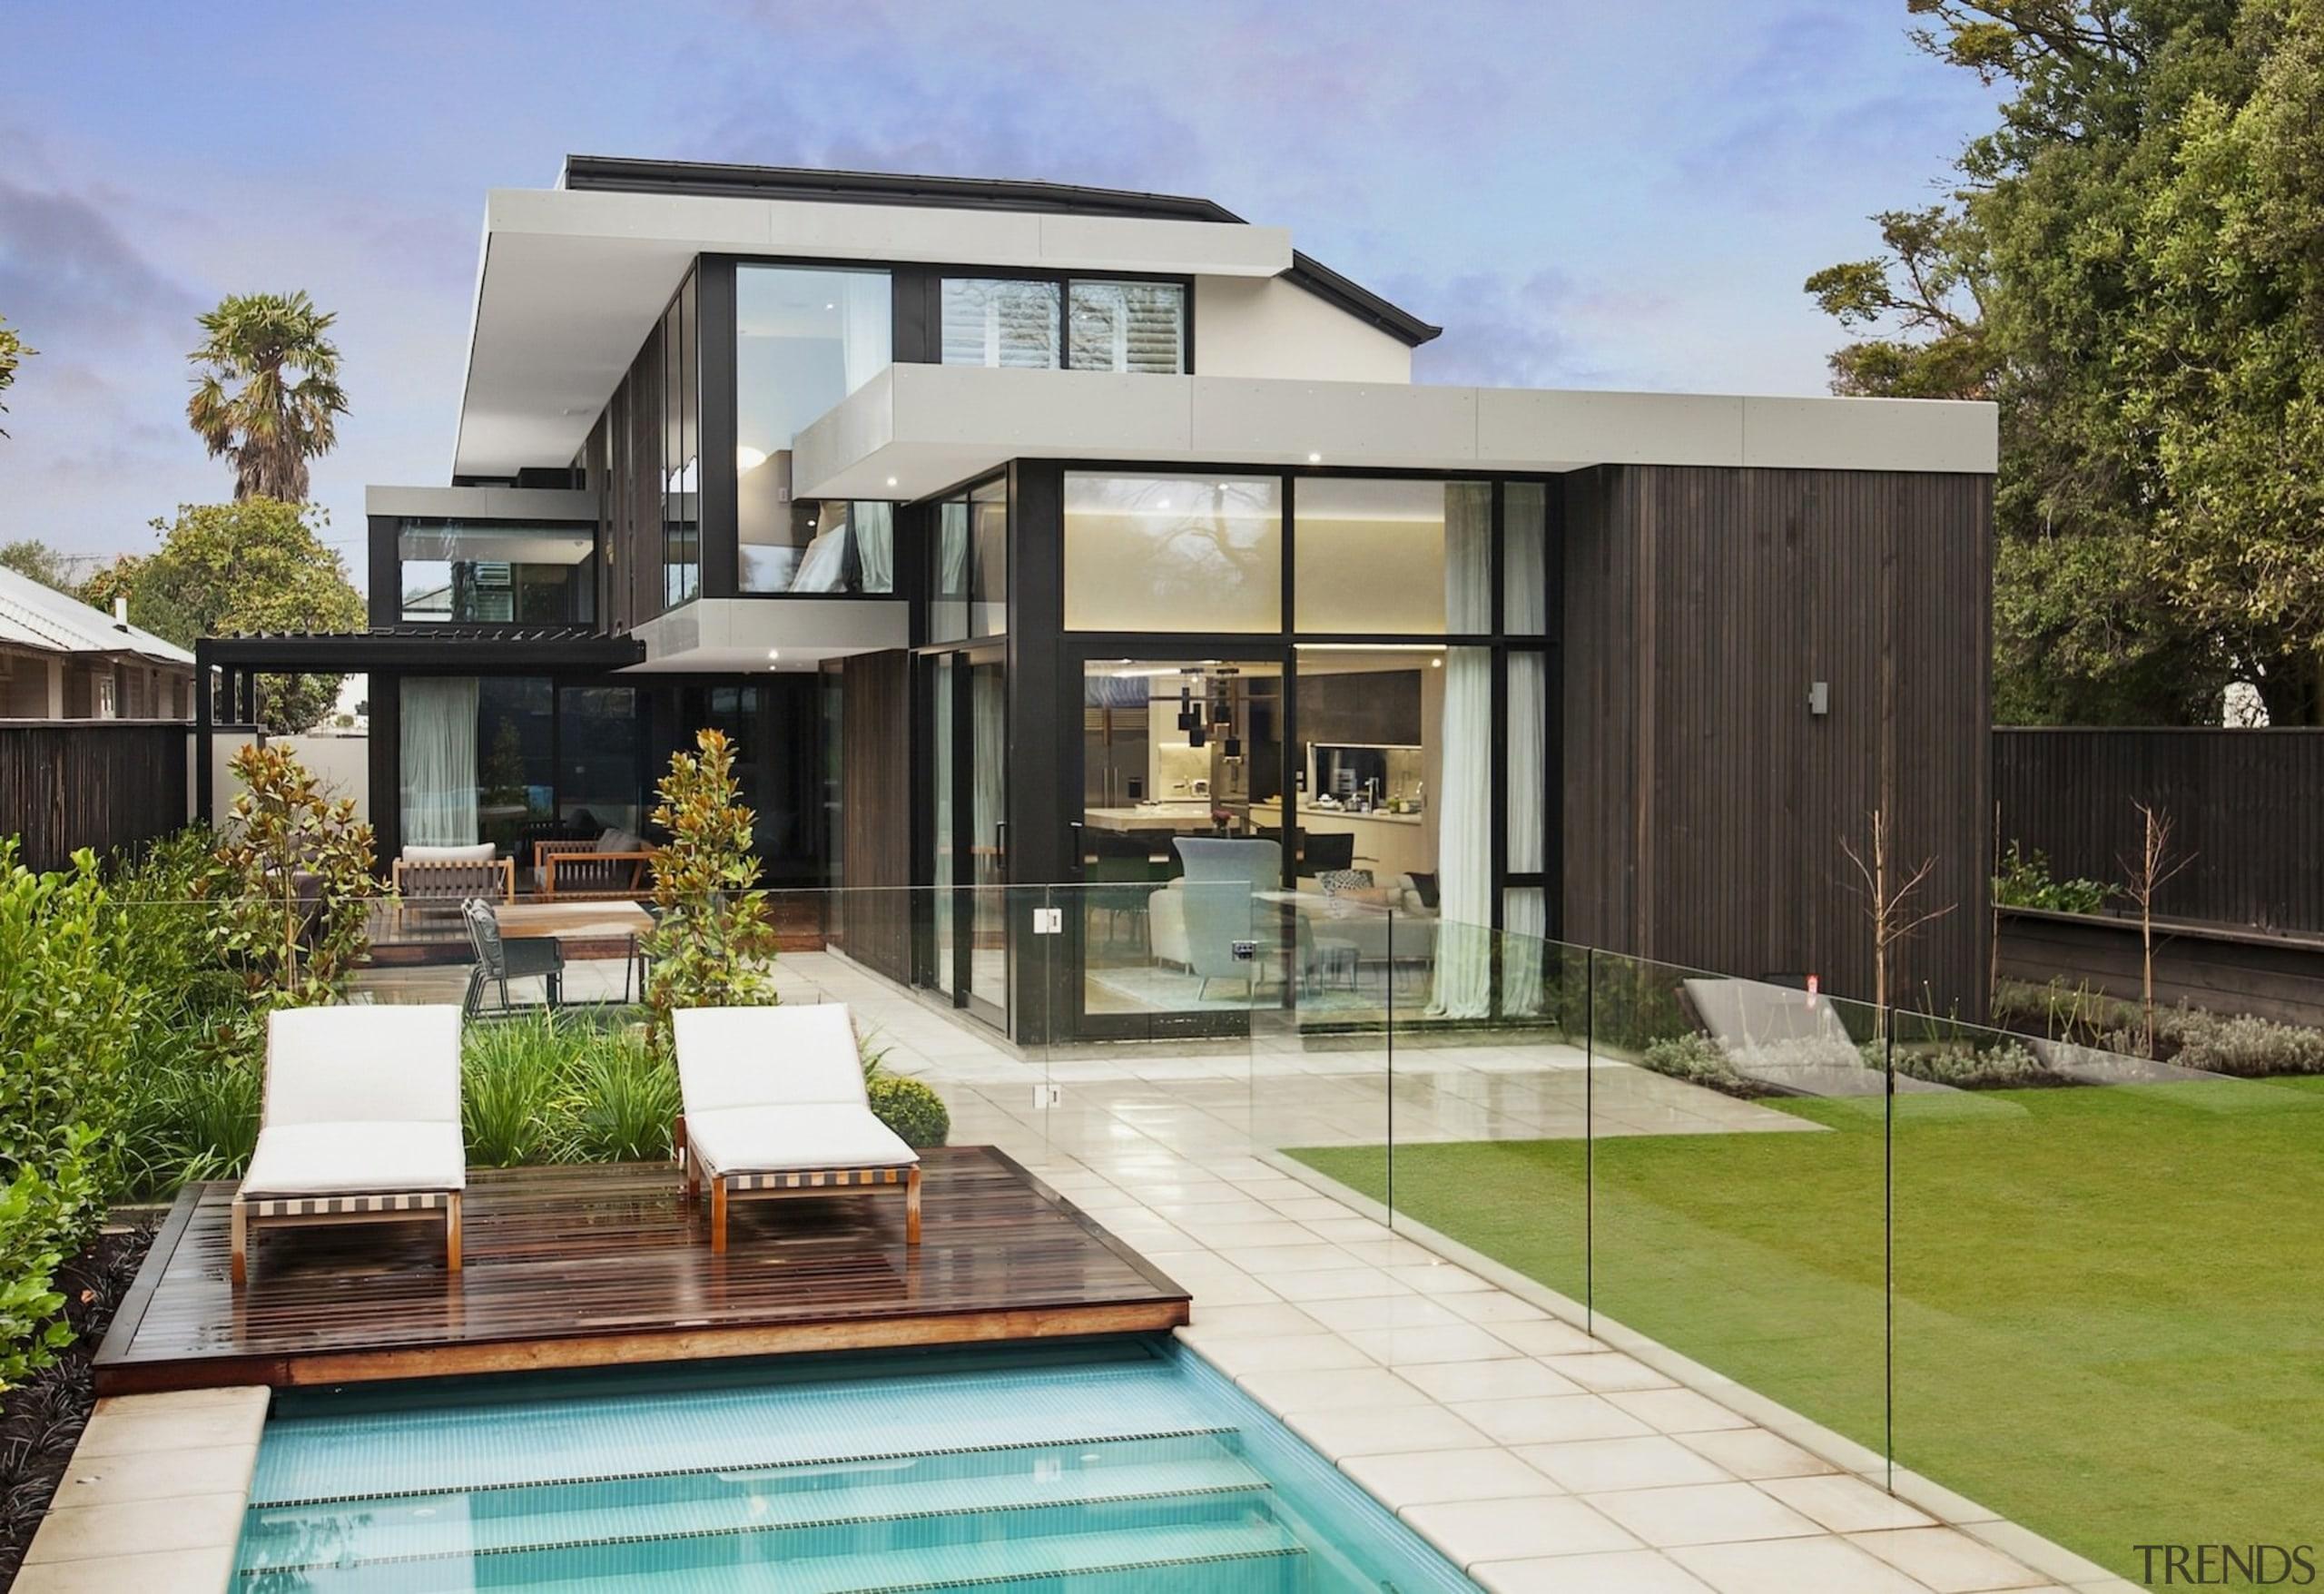 TIDA NZ 2017 – Designer new home winner architecture, backyard, elevation, estate, facade, home, house, property, real estate, residential area, swimming pool, villa